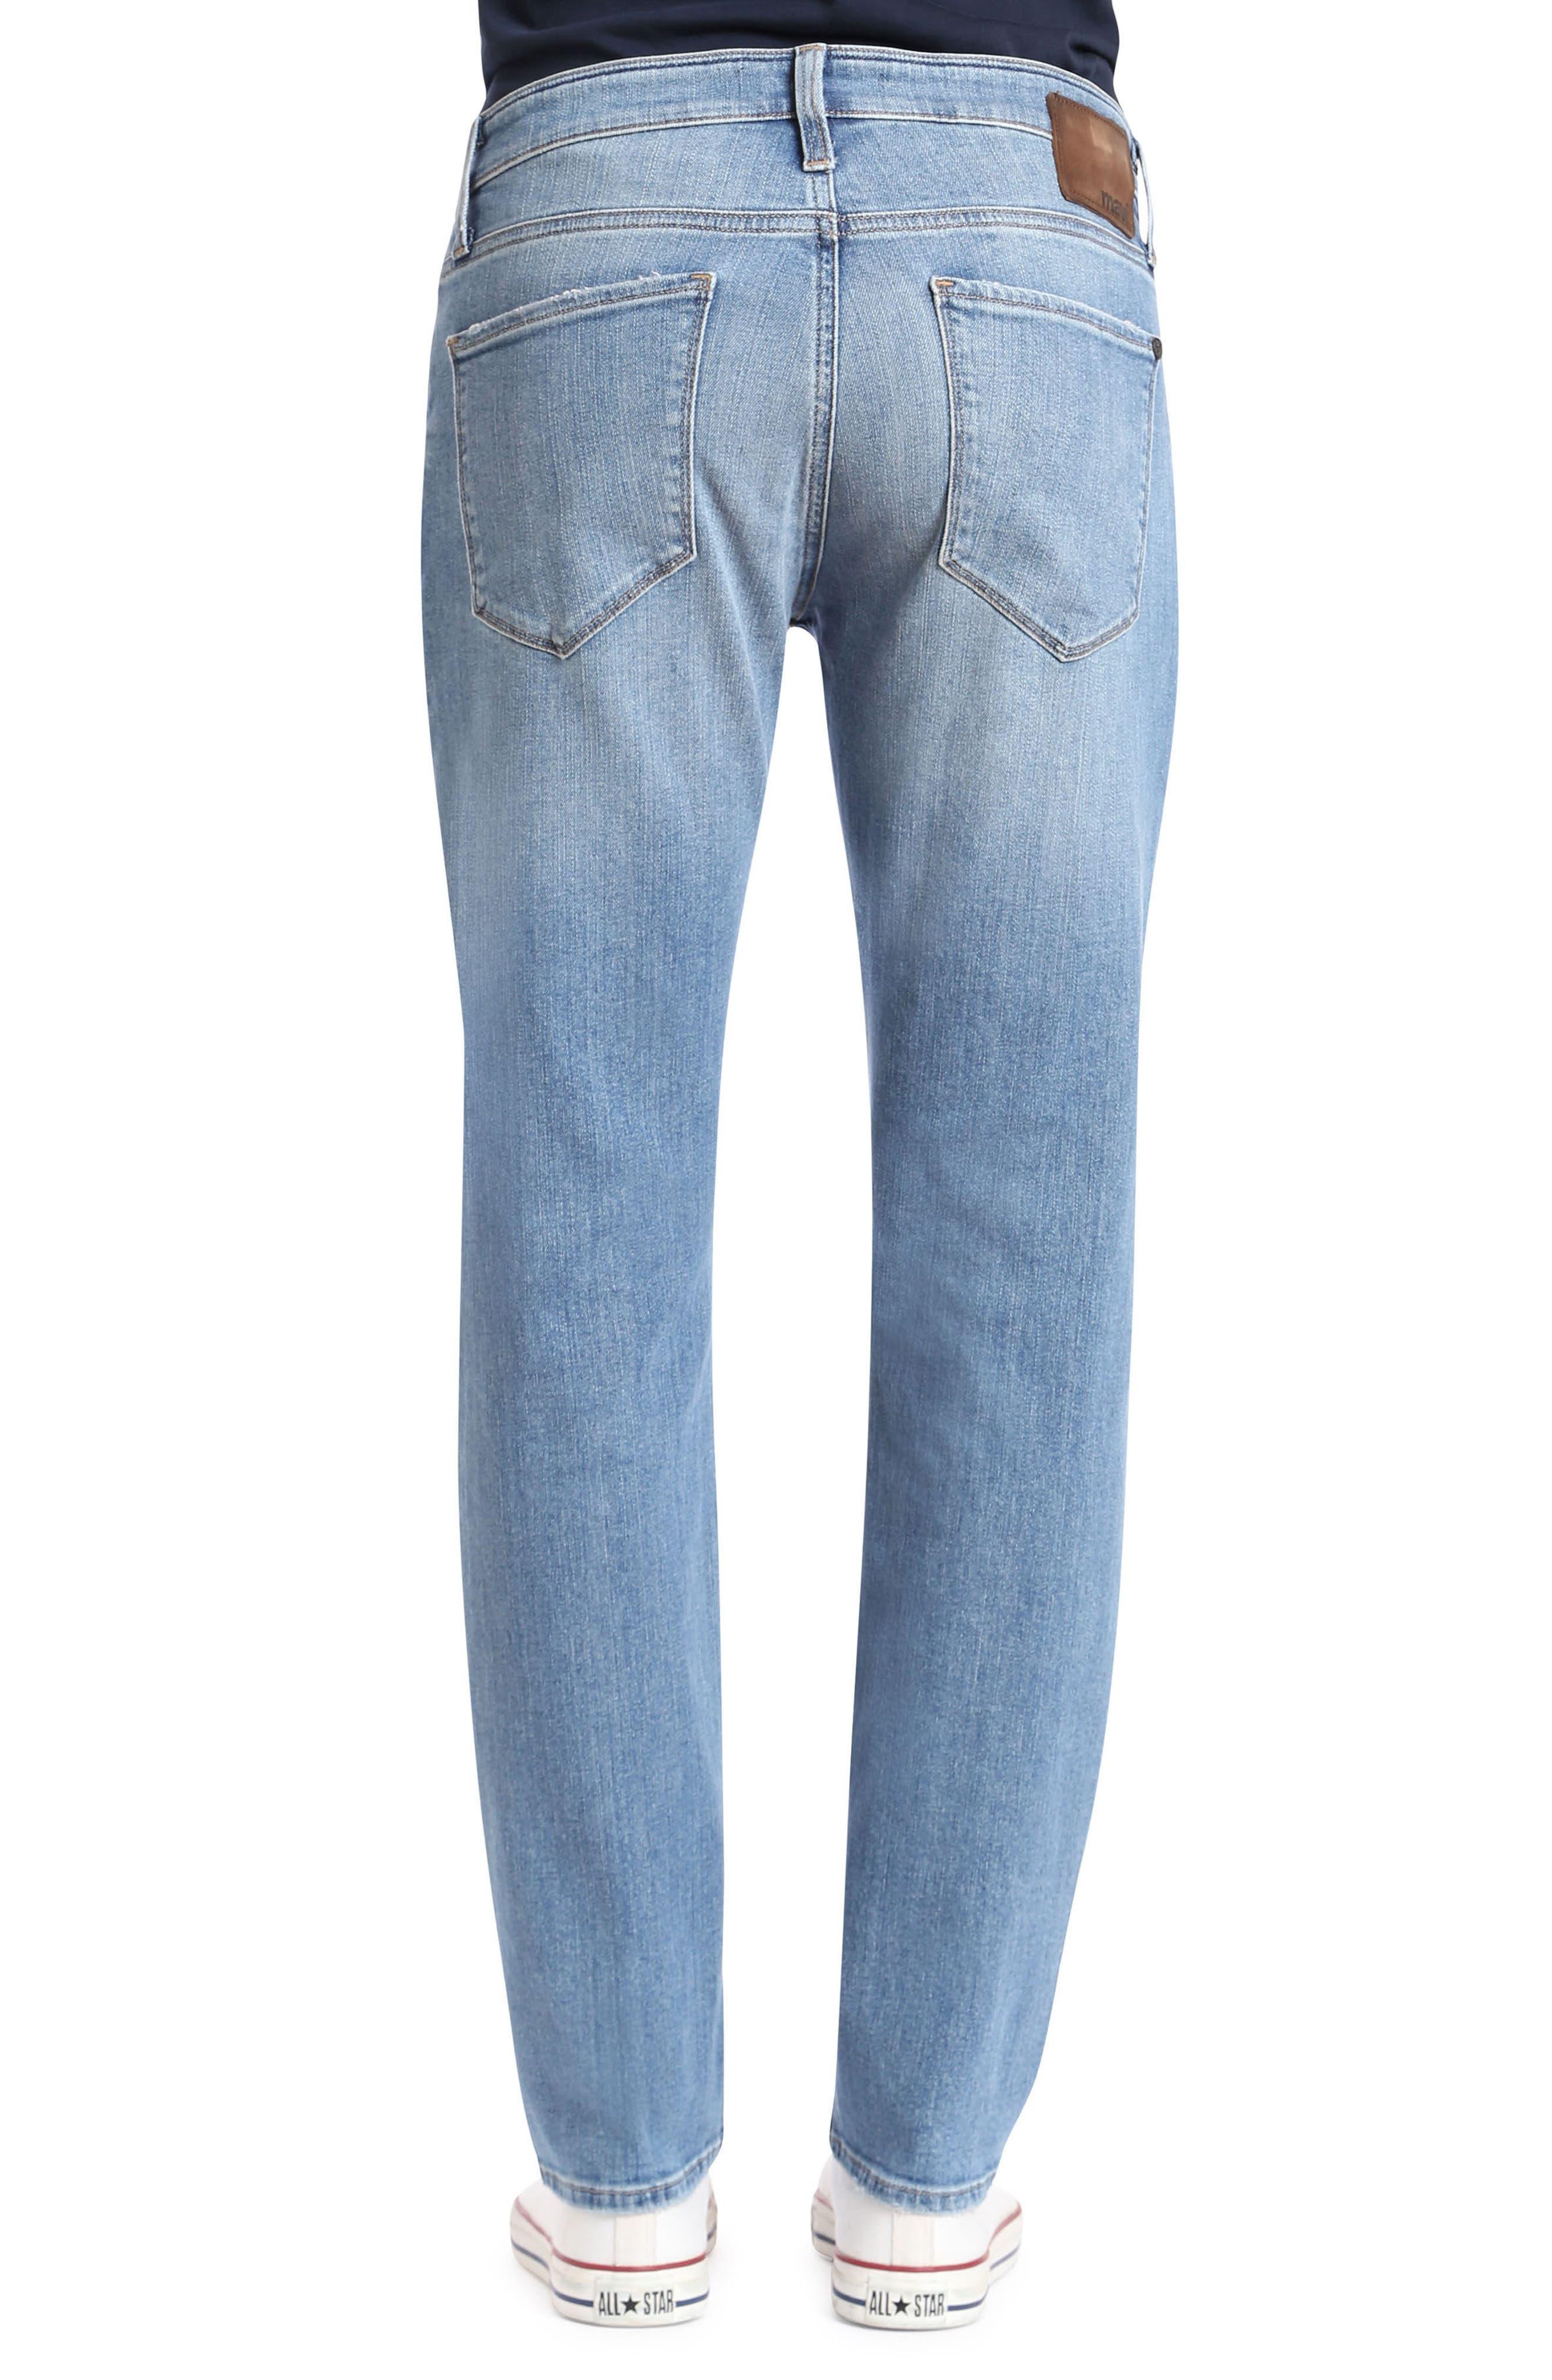 Jake Slim Fit Jeans,                             Alternate thumbnail 2, color,                             420